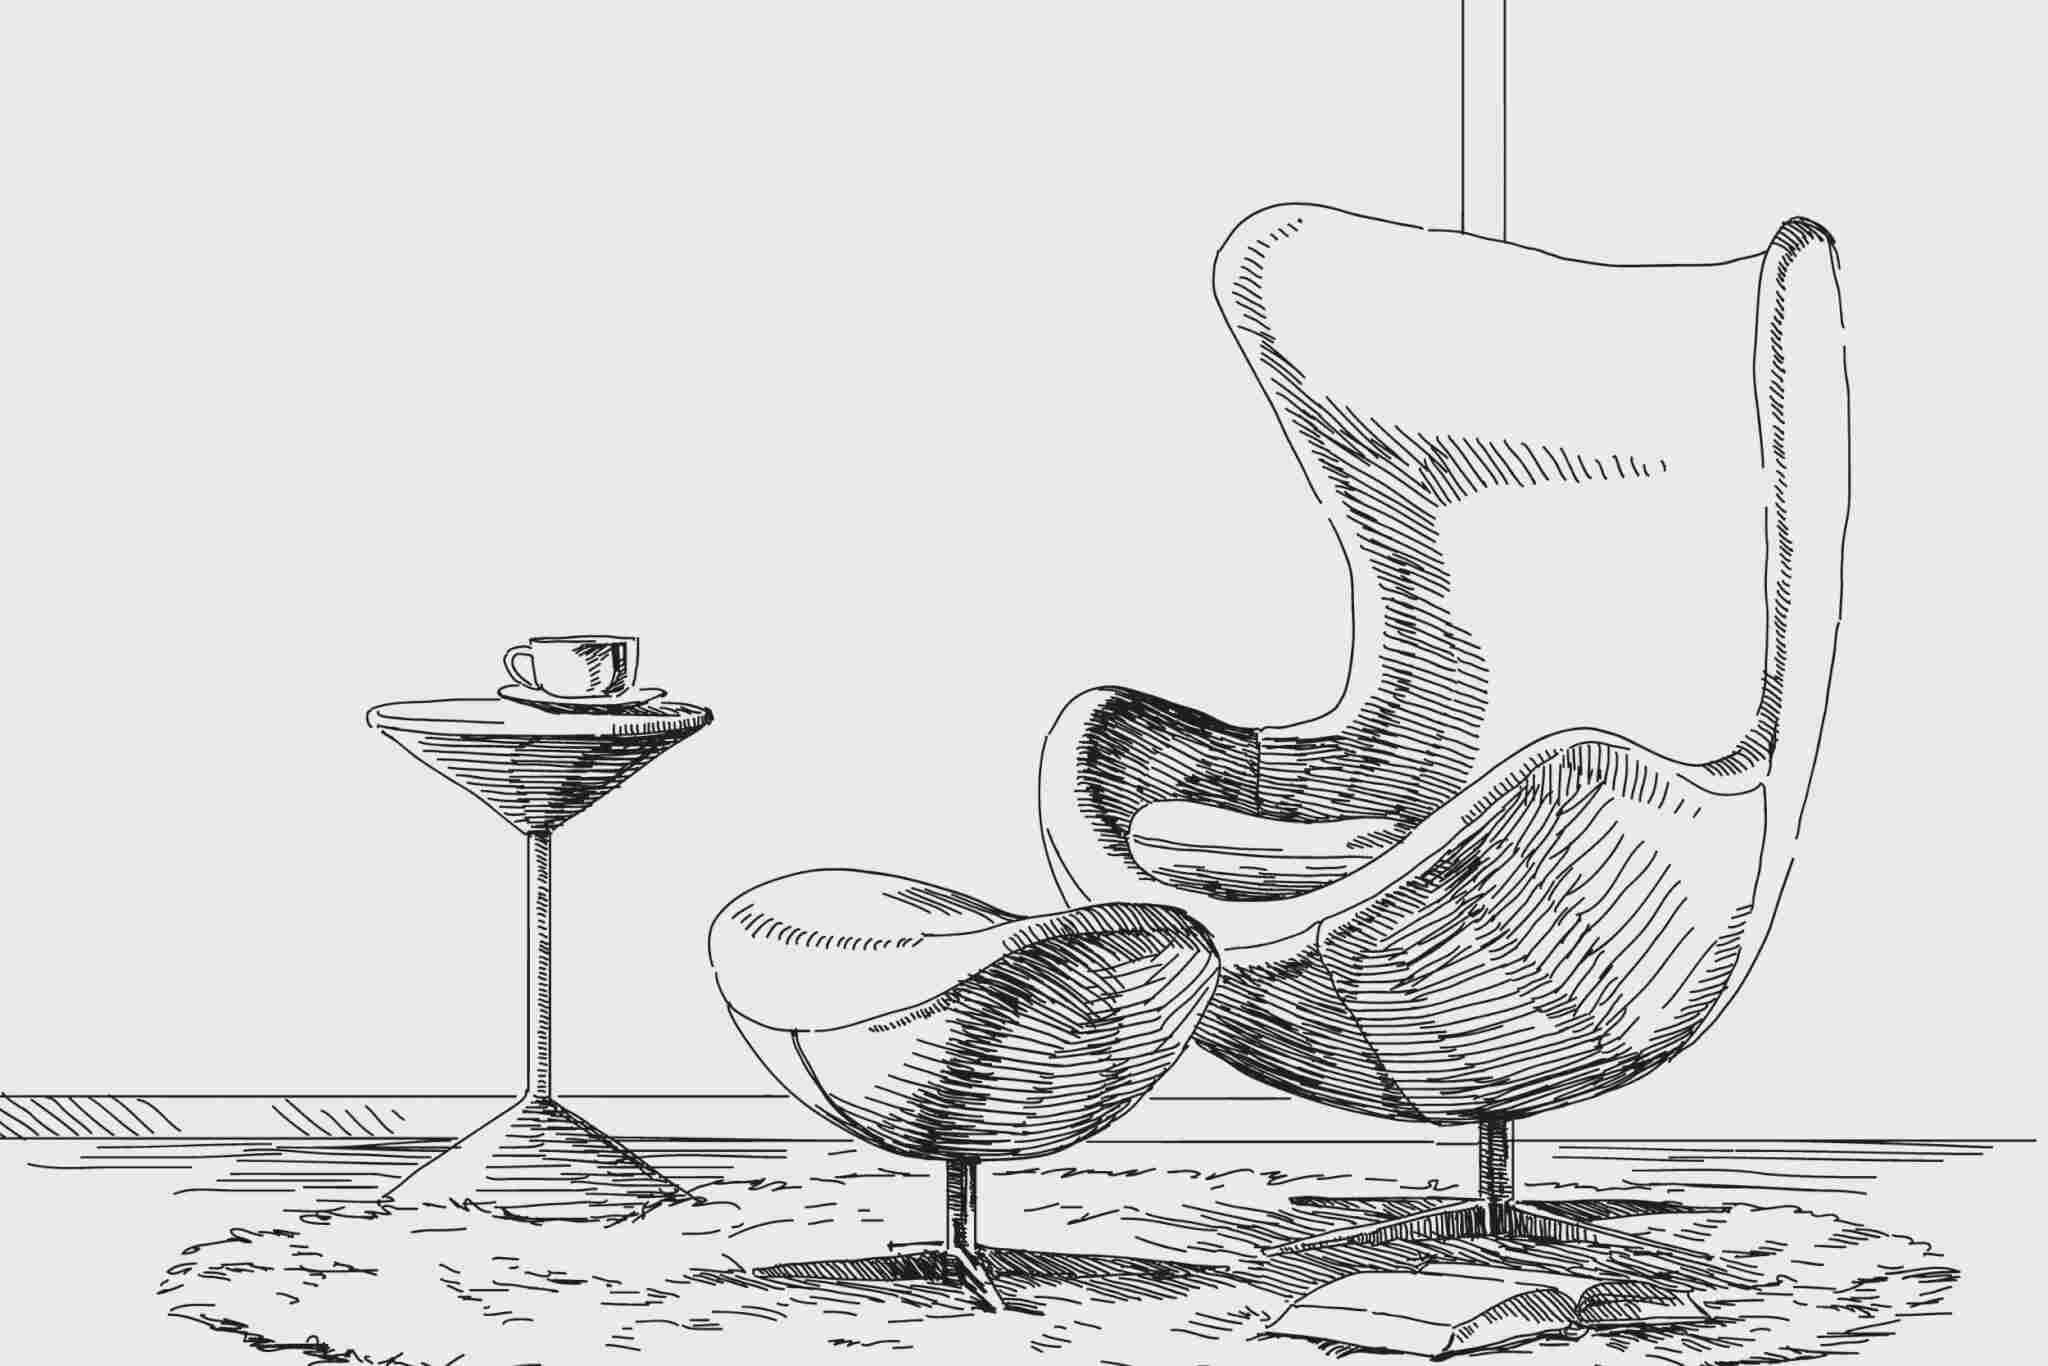 https://dev.ekipdeco.com/wp-content/uploads/2017/05/image-lined-chair.jpg